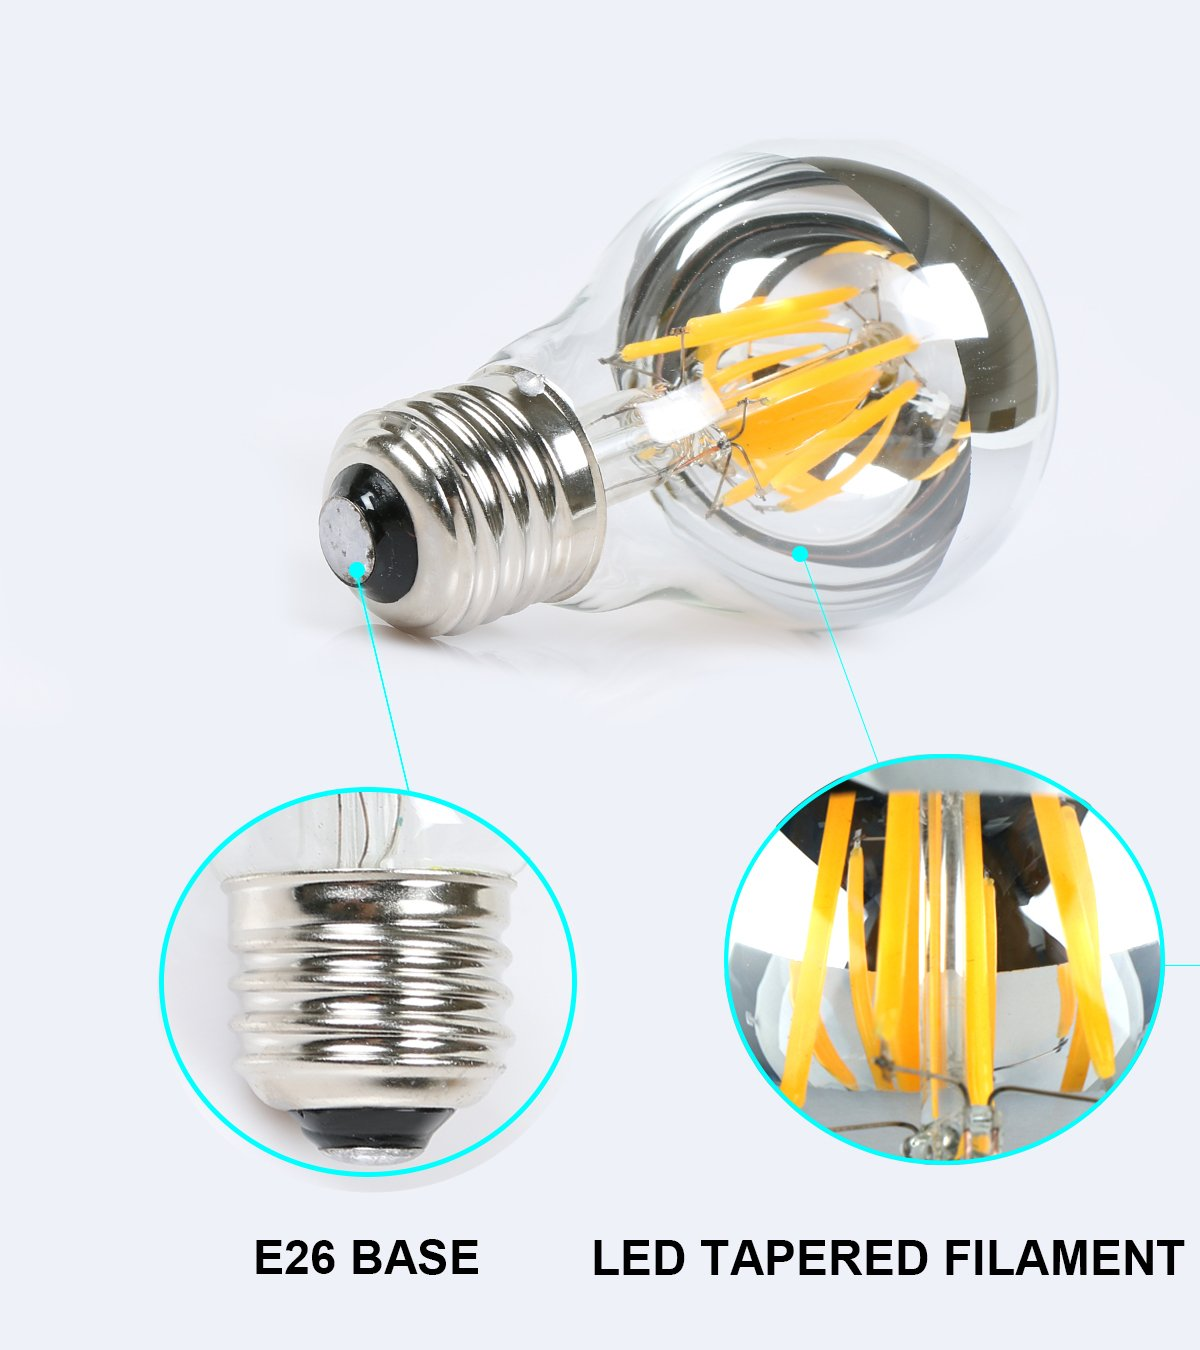 TOP YAO 6w A60 E26 Based LED Filament Vintage Dimmable Bulb with Mirror Half Chrome Silver Globe Shape Bulb Energy Saving 2700k Warm White